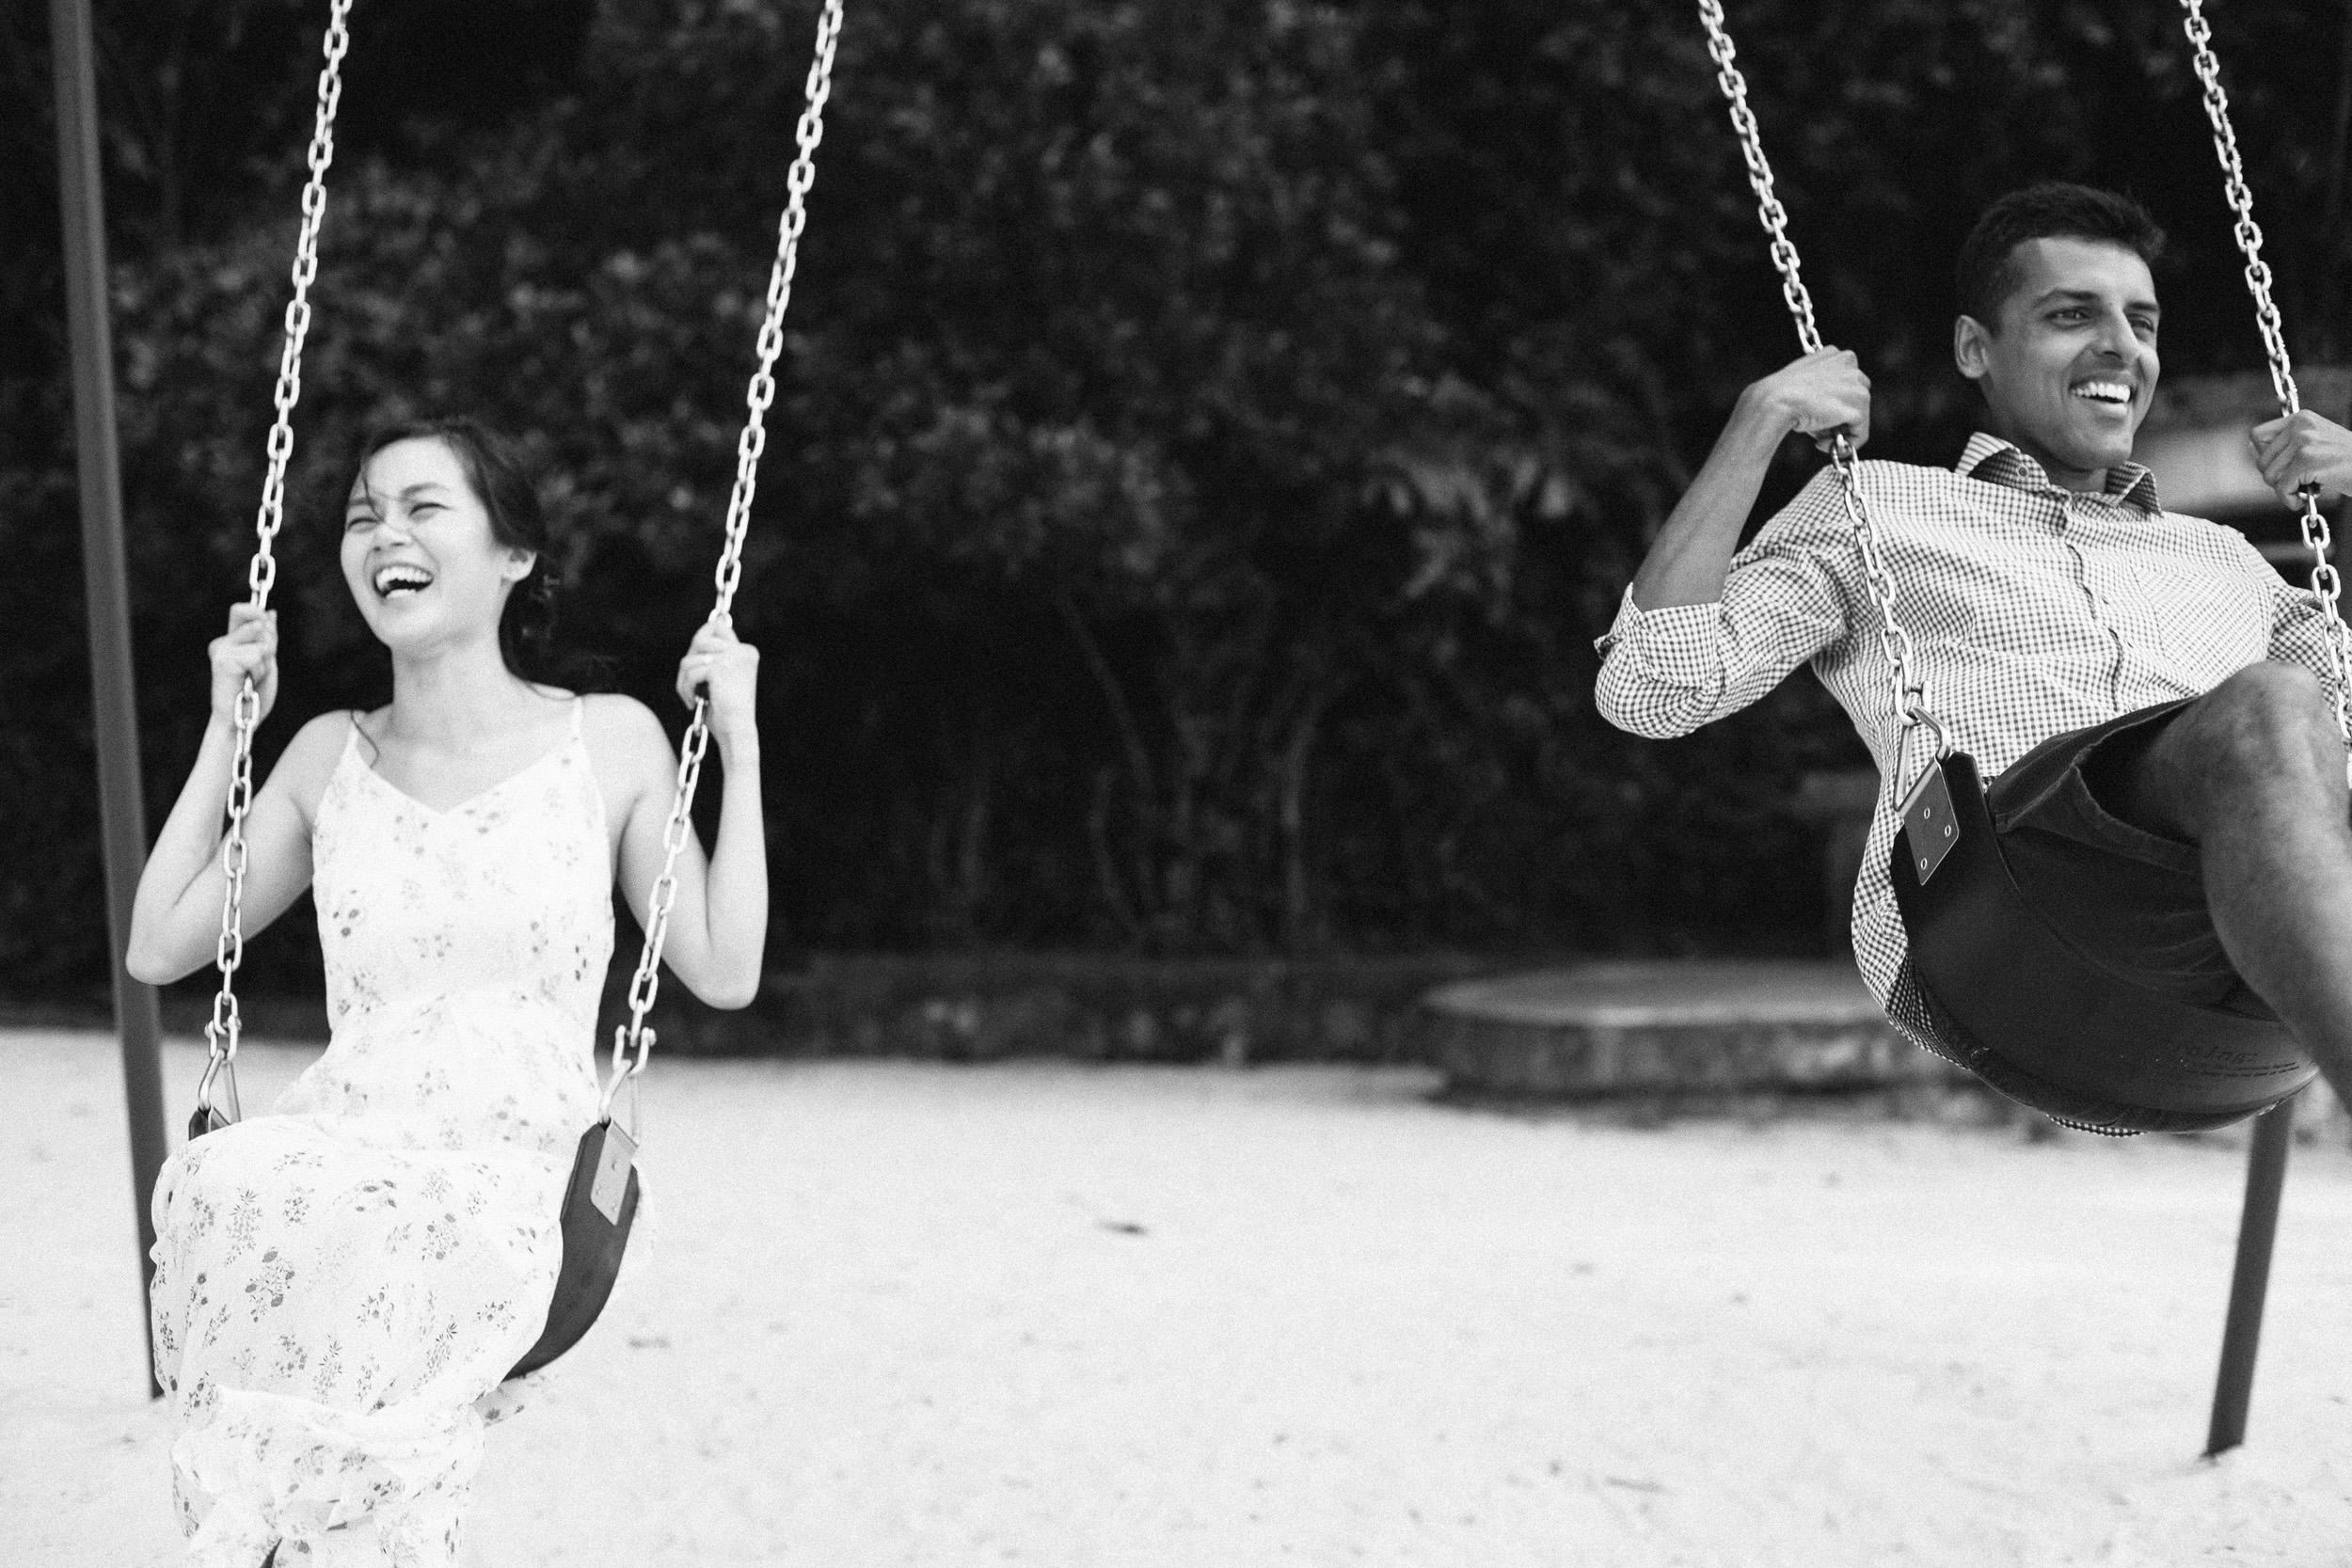 singapore-wedding-photographer-photography-wmt2017-135.jpg